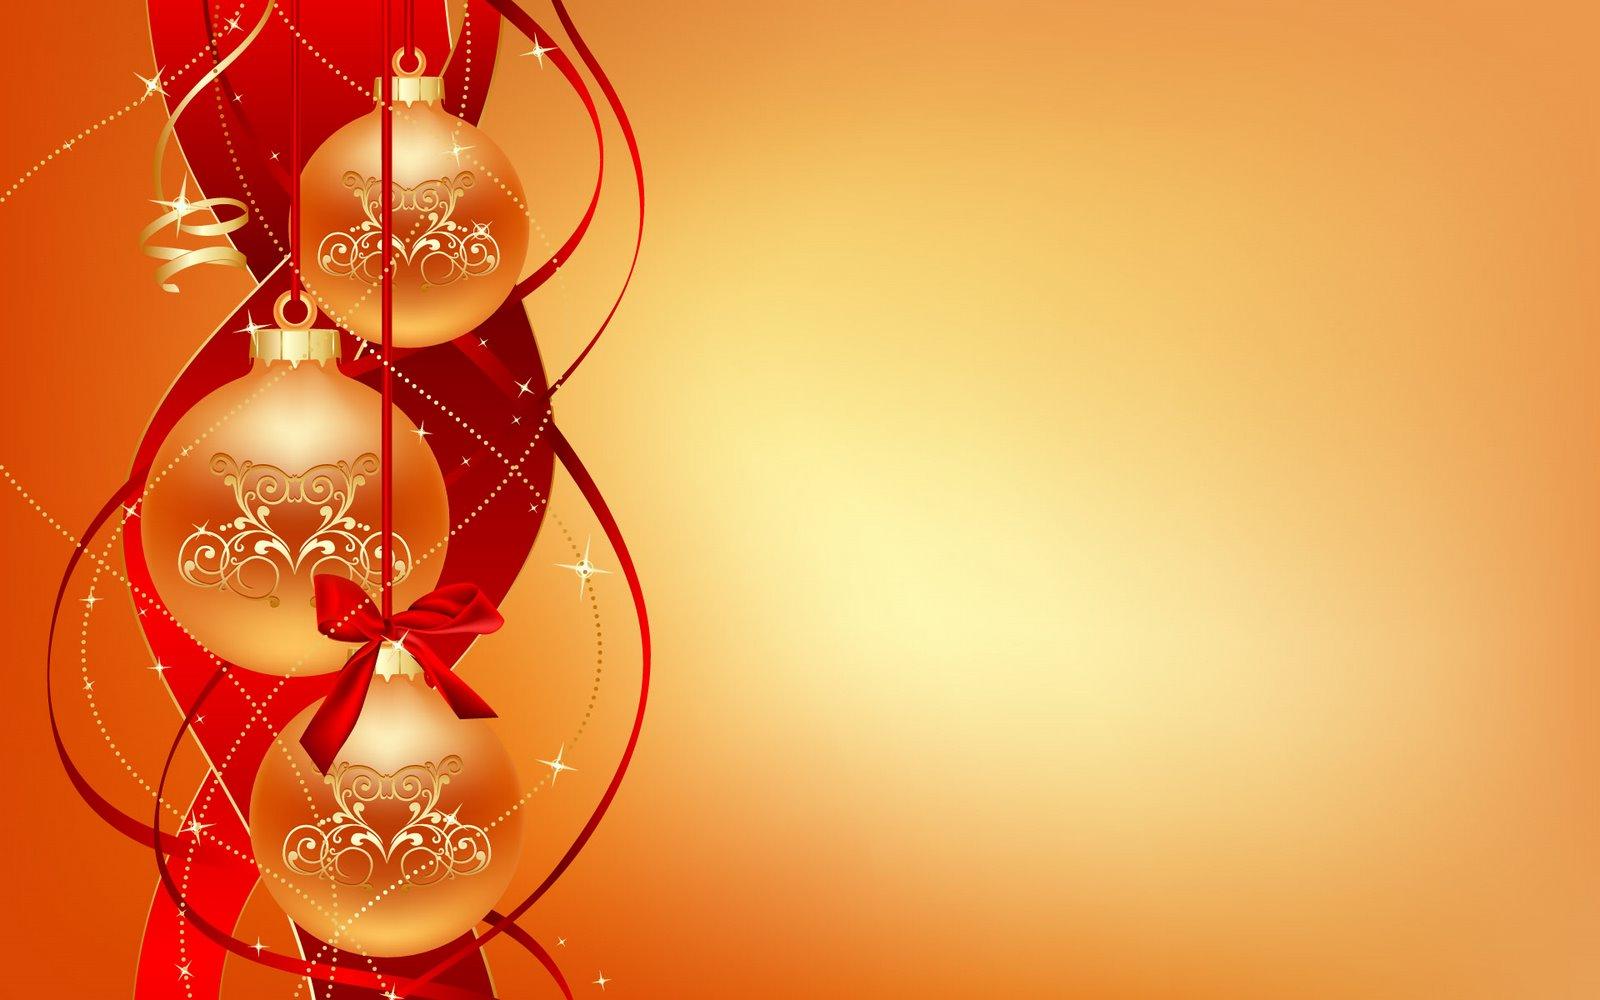 http://2.bp.blogspot.com/_W1ueYt1O3xs/SUDvMMznEoI/AAAAAAAANJk/0QwGAhOlHpA/s1600/Christmas+Wallpapers+%2827%29.jpg